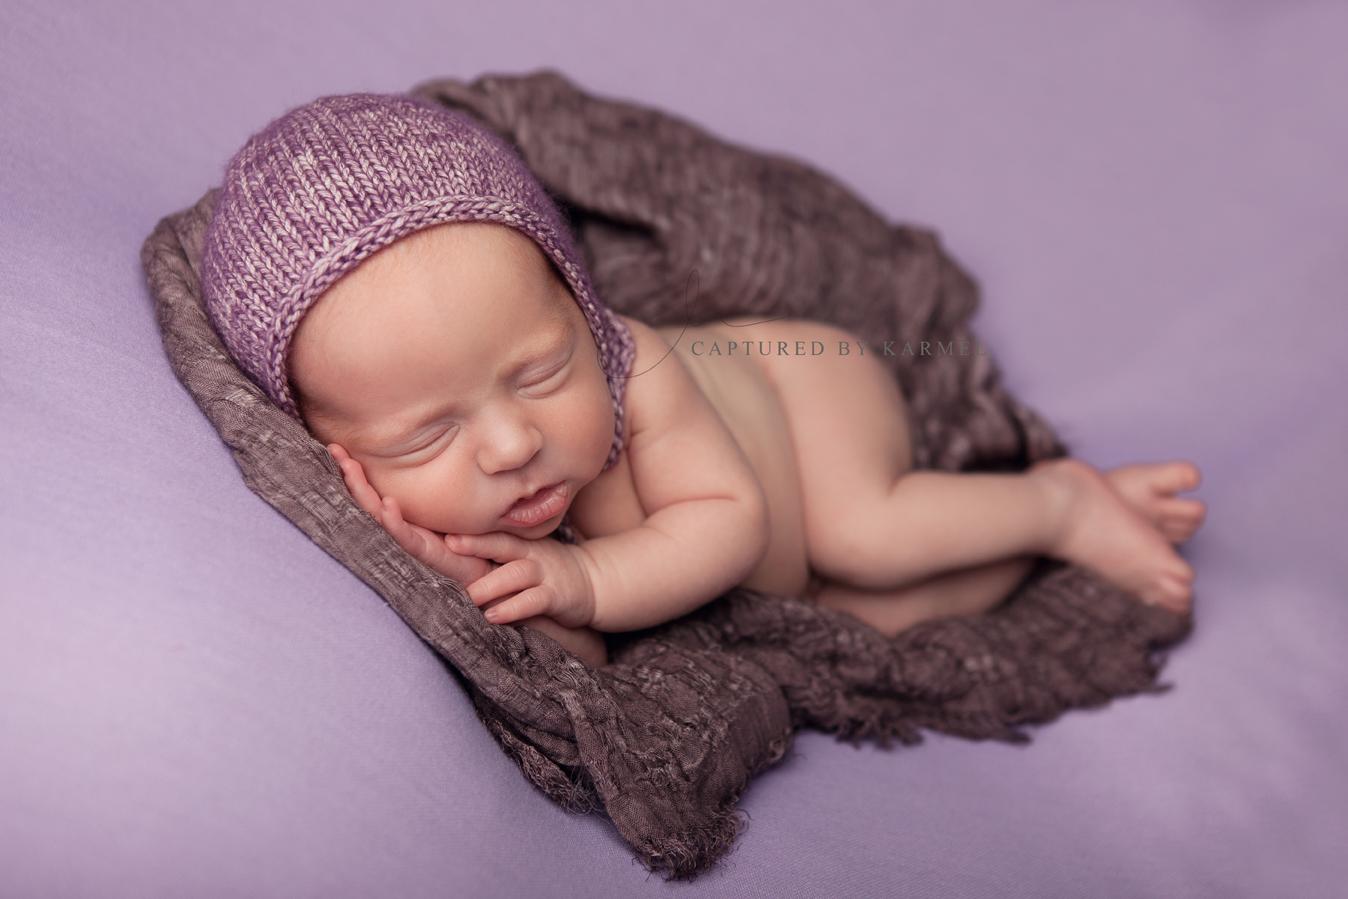 newborn sleeping on purple backdrop